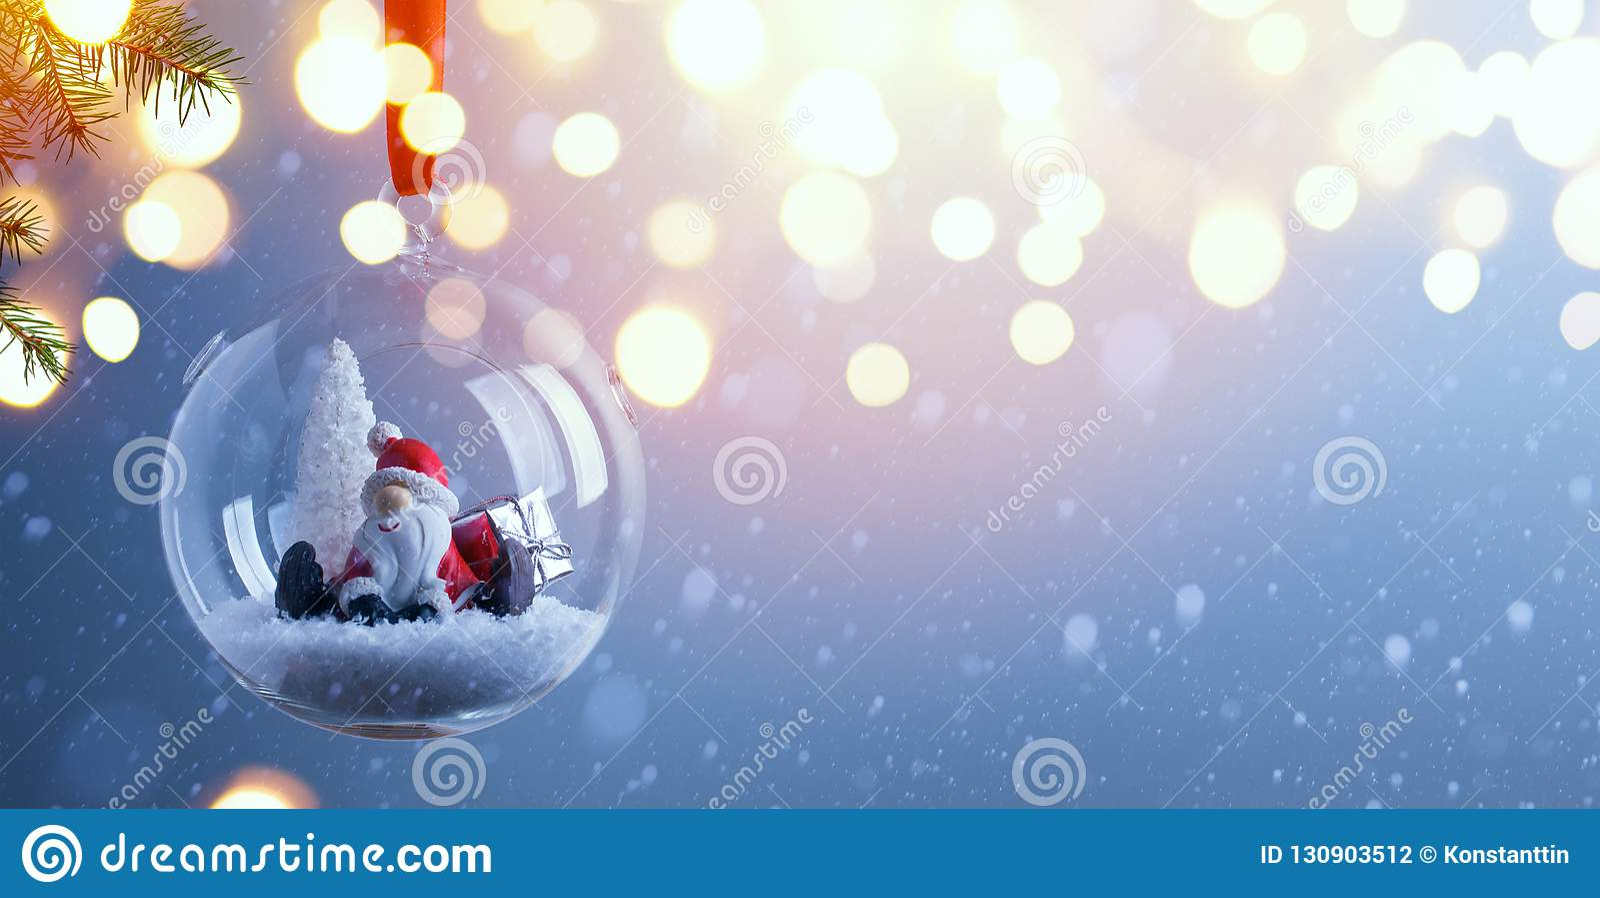 Christmas Greetings Background.Art Christmas Greeting Card Background Or Season Holidays